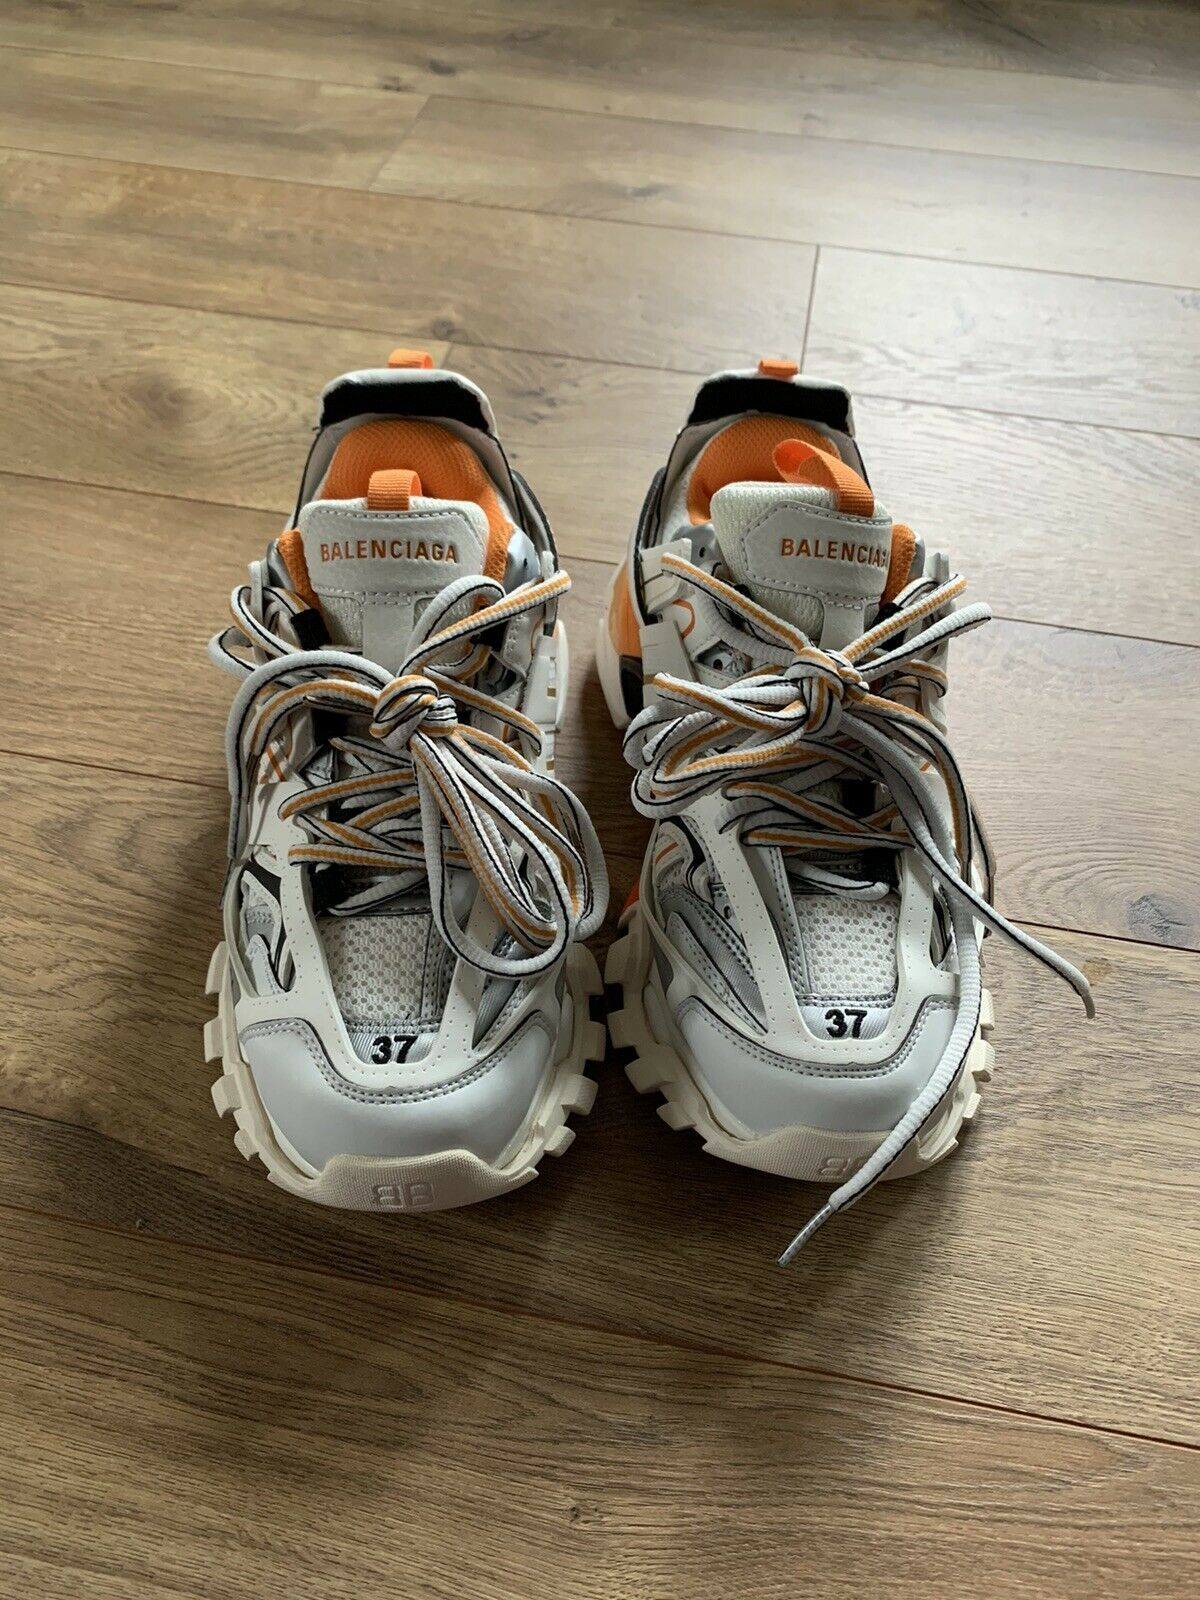 Balenciaga Track Sneaker White Orange 37 Sneakers Sneakers White Sneakers Fashion